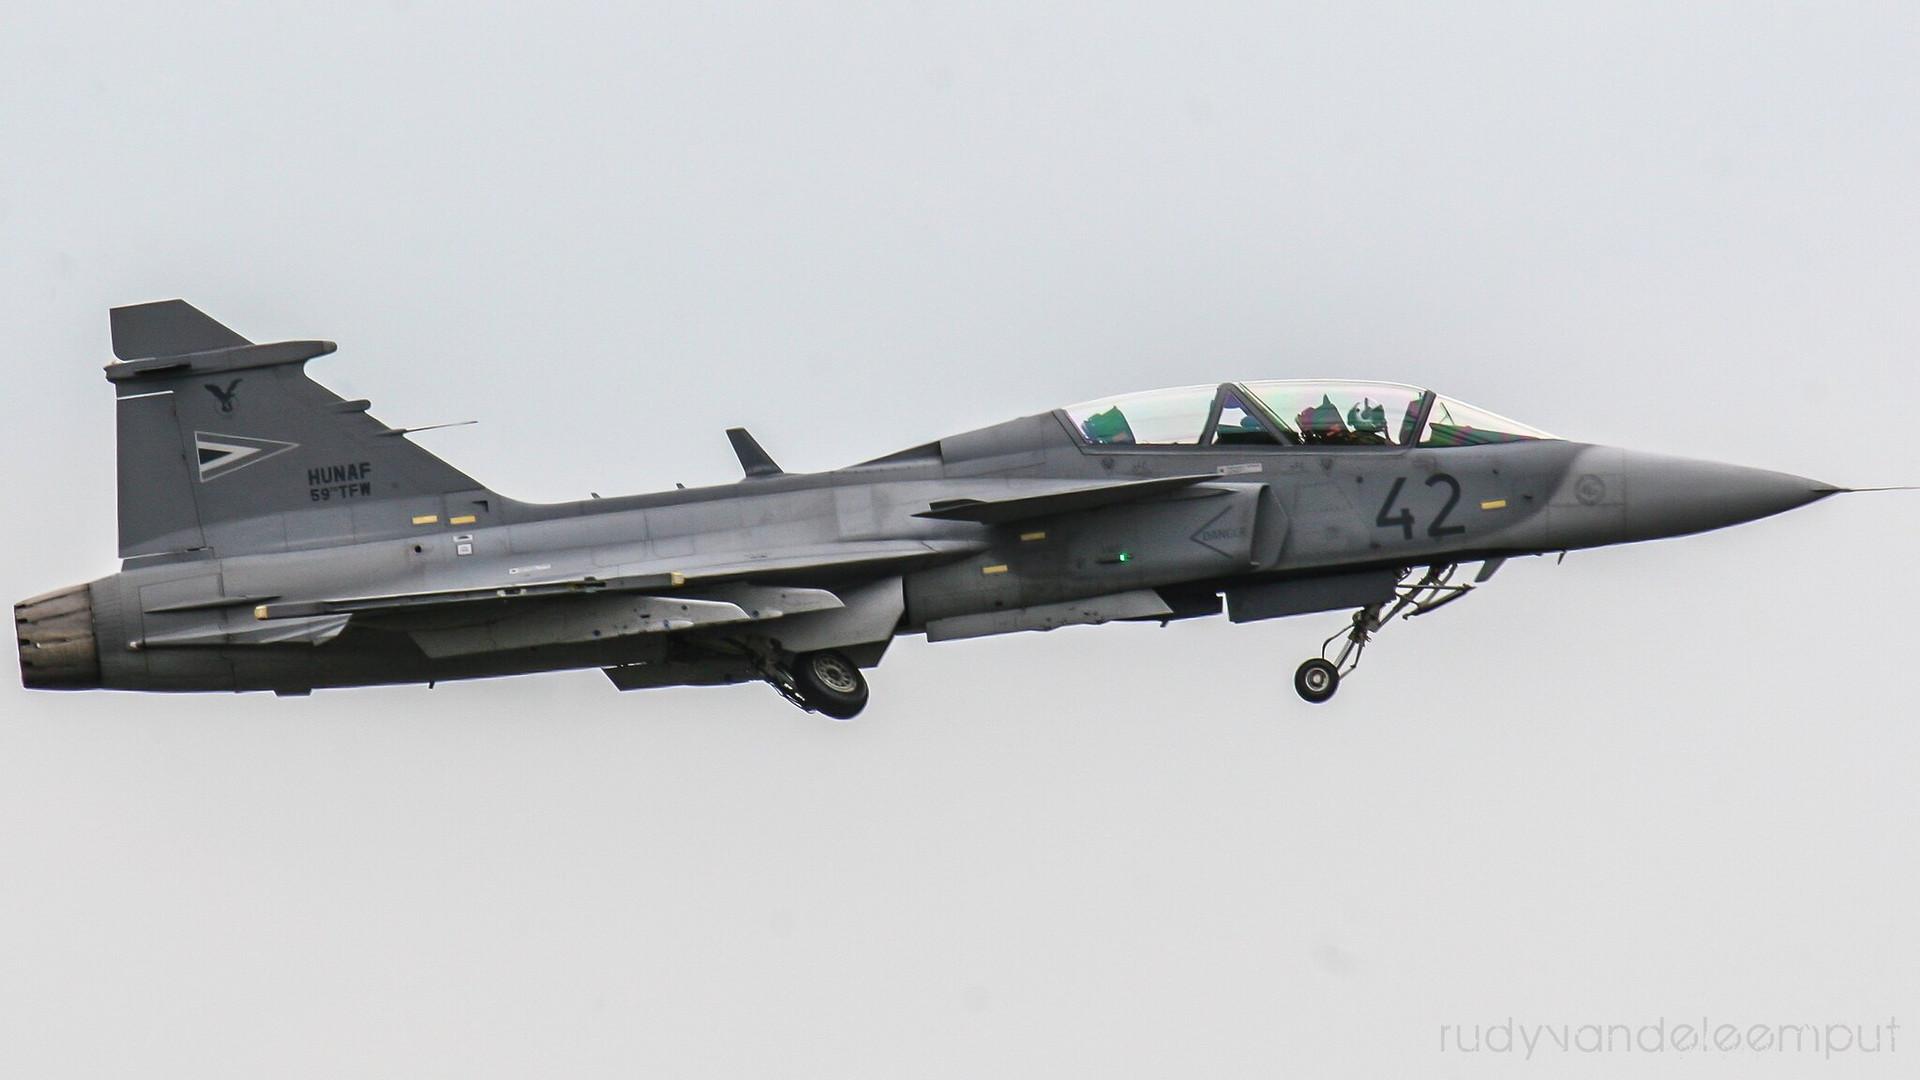 42 | SAAB JAS 39D Gripen